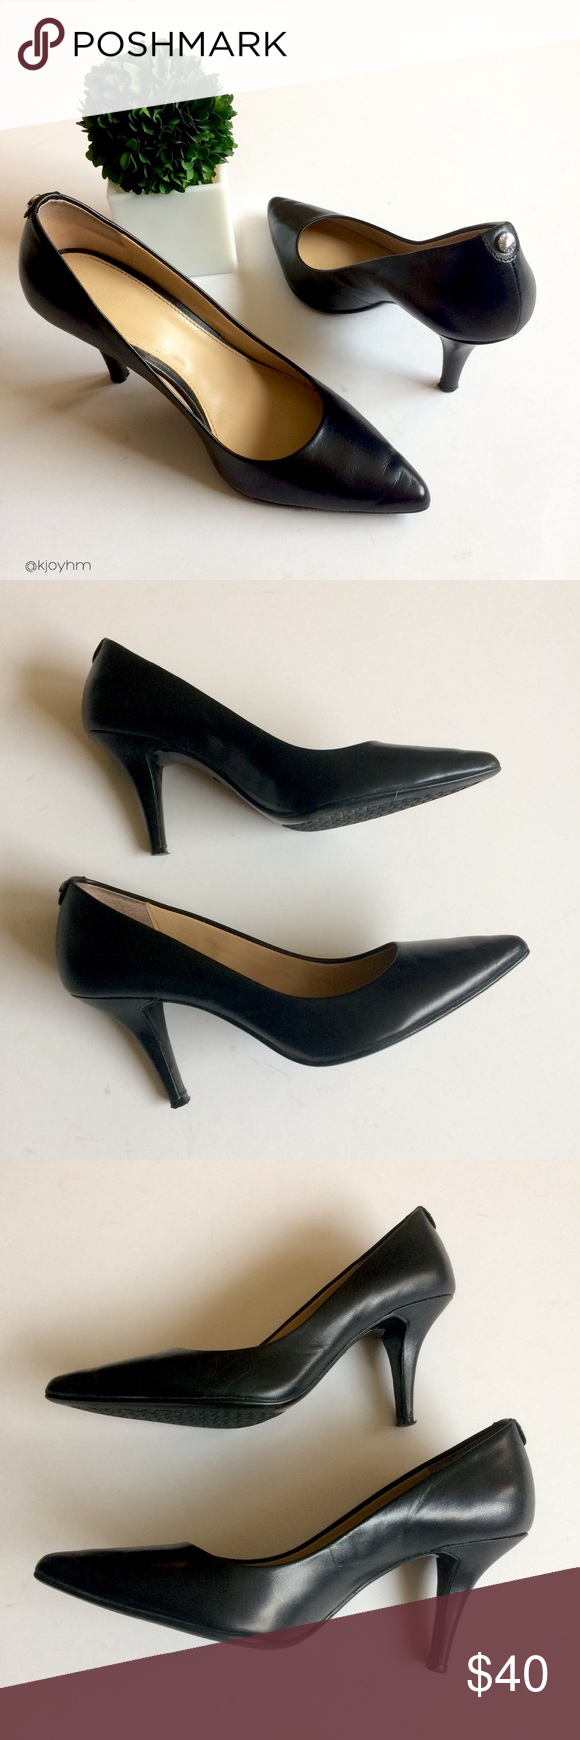 017a9abf31e Leather Court Shoes. Michael Kors